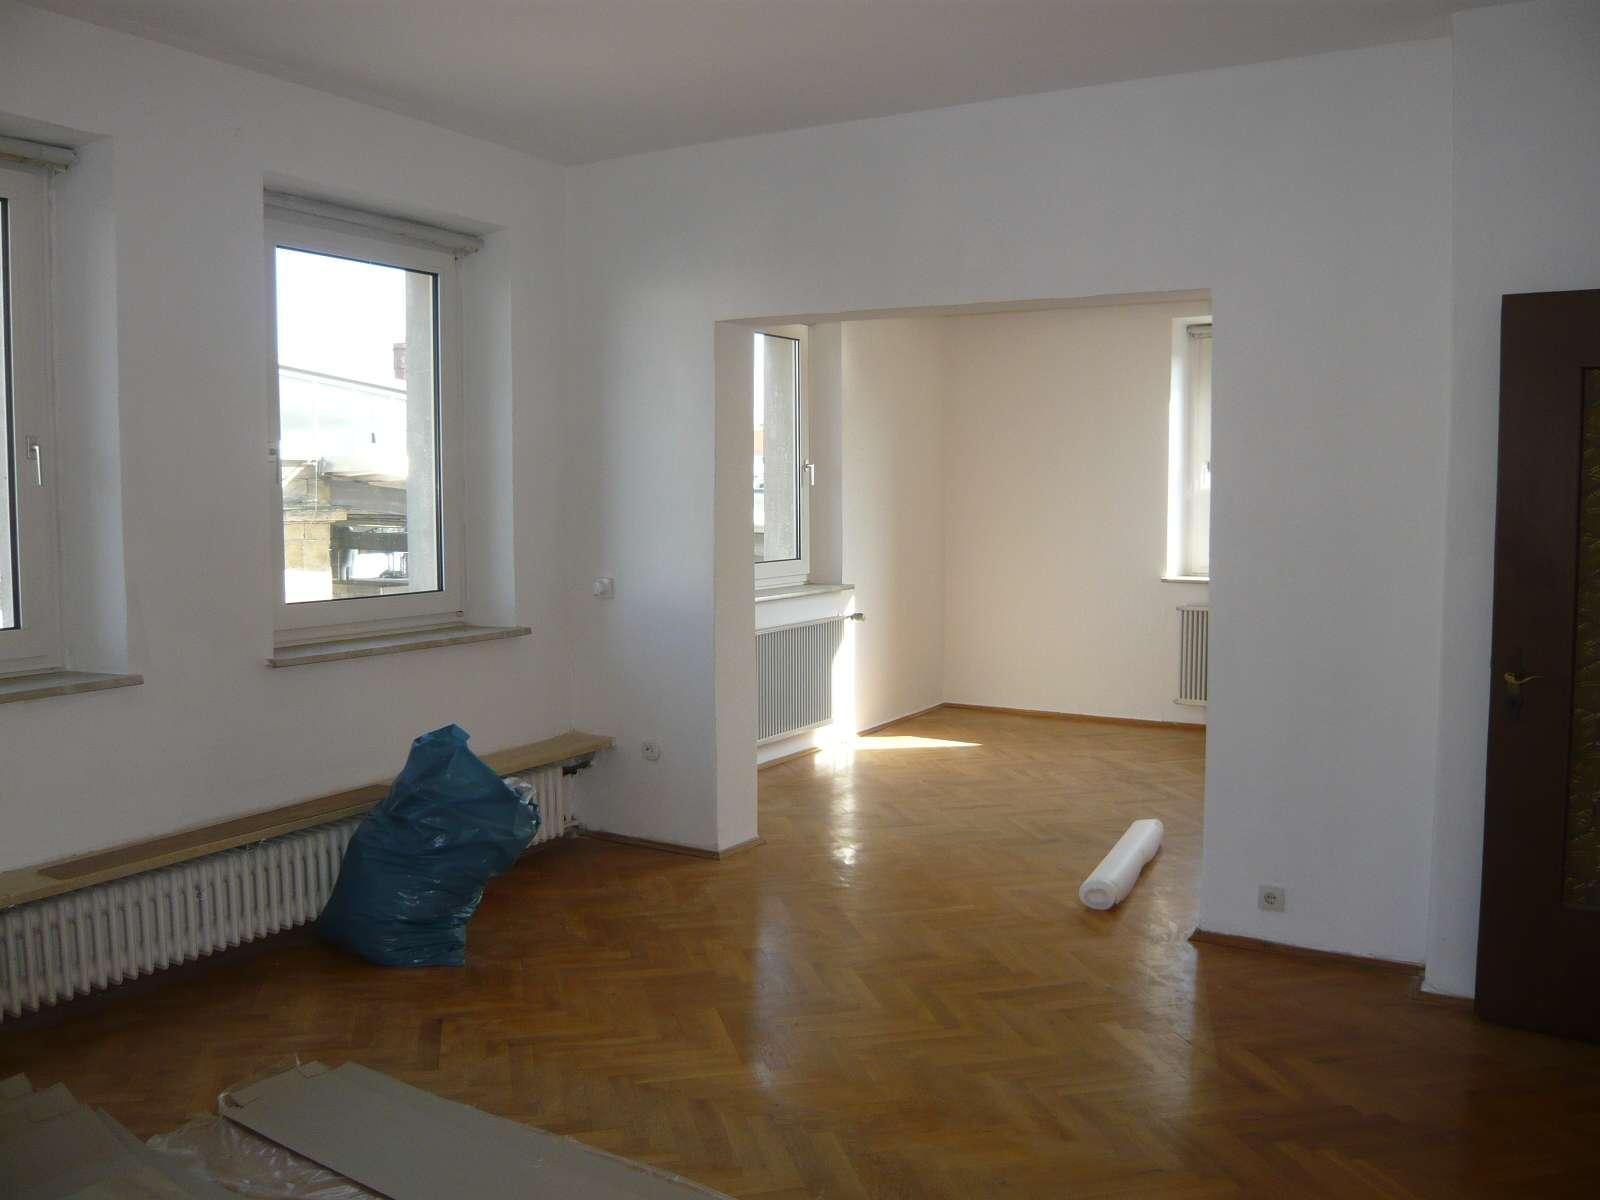 4-Zi. Wohnung am Bahnhof in City (Bayreuth)